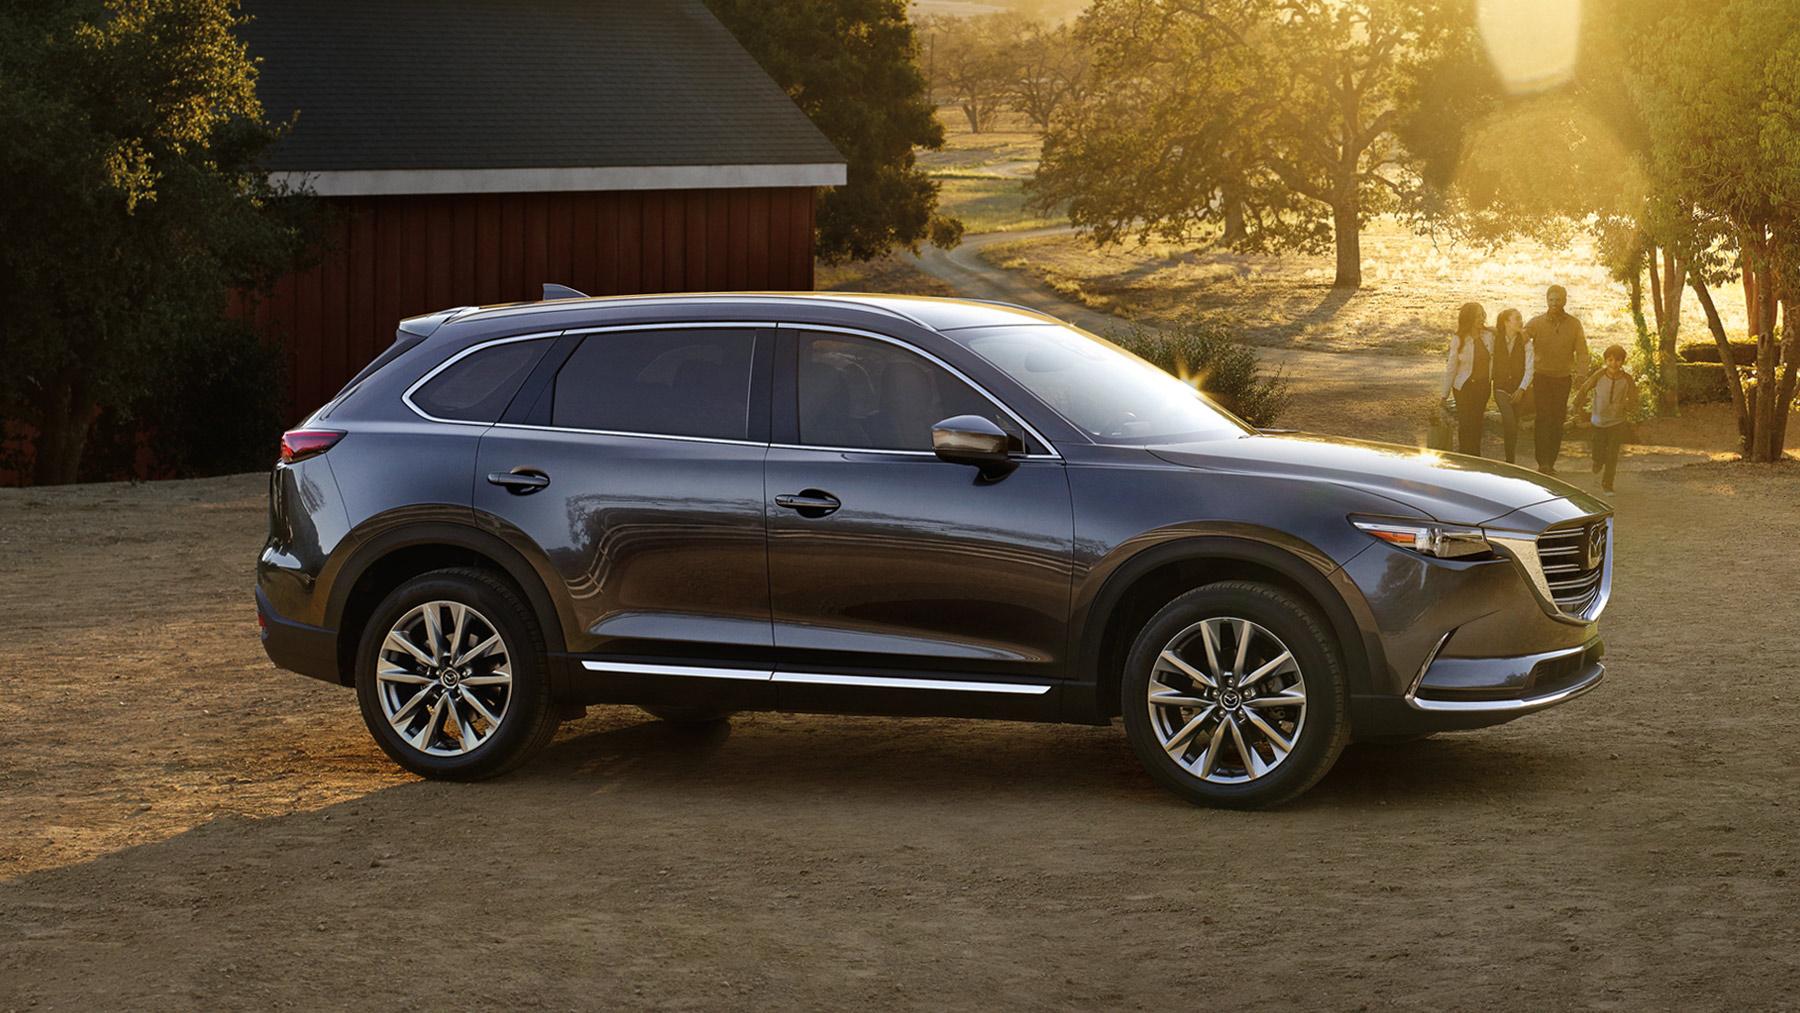 2017 Mazda CX-9 fuel economy and driving range